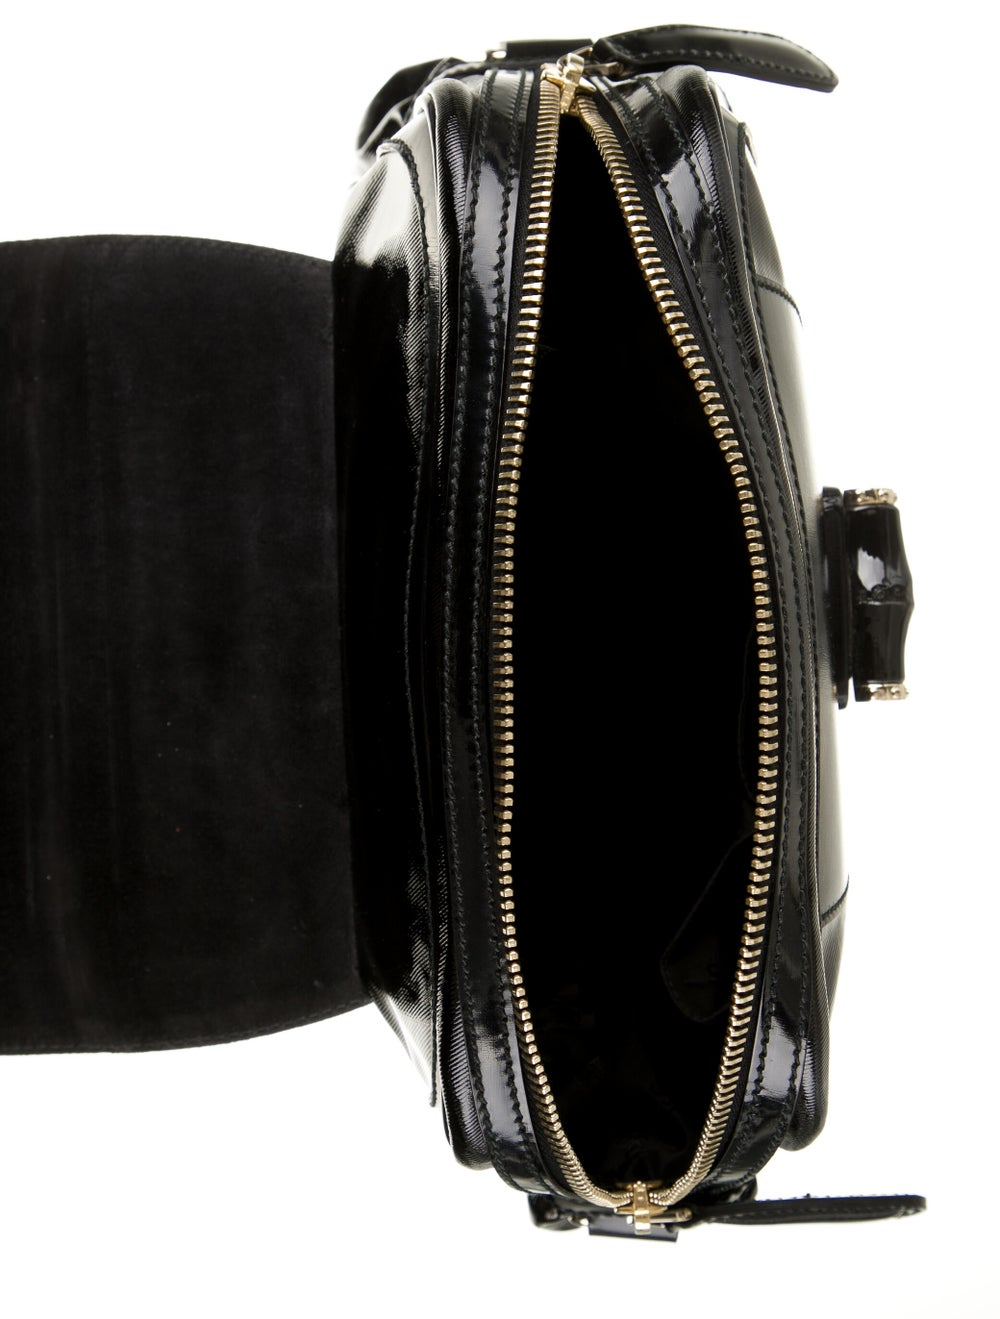 Gucci Pop Bamboo Handle Bag Black - image 5